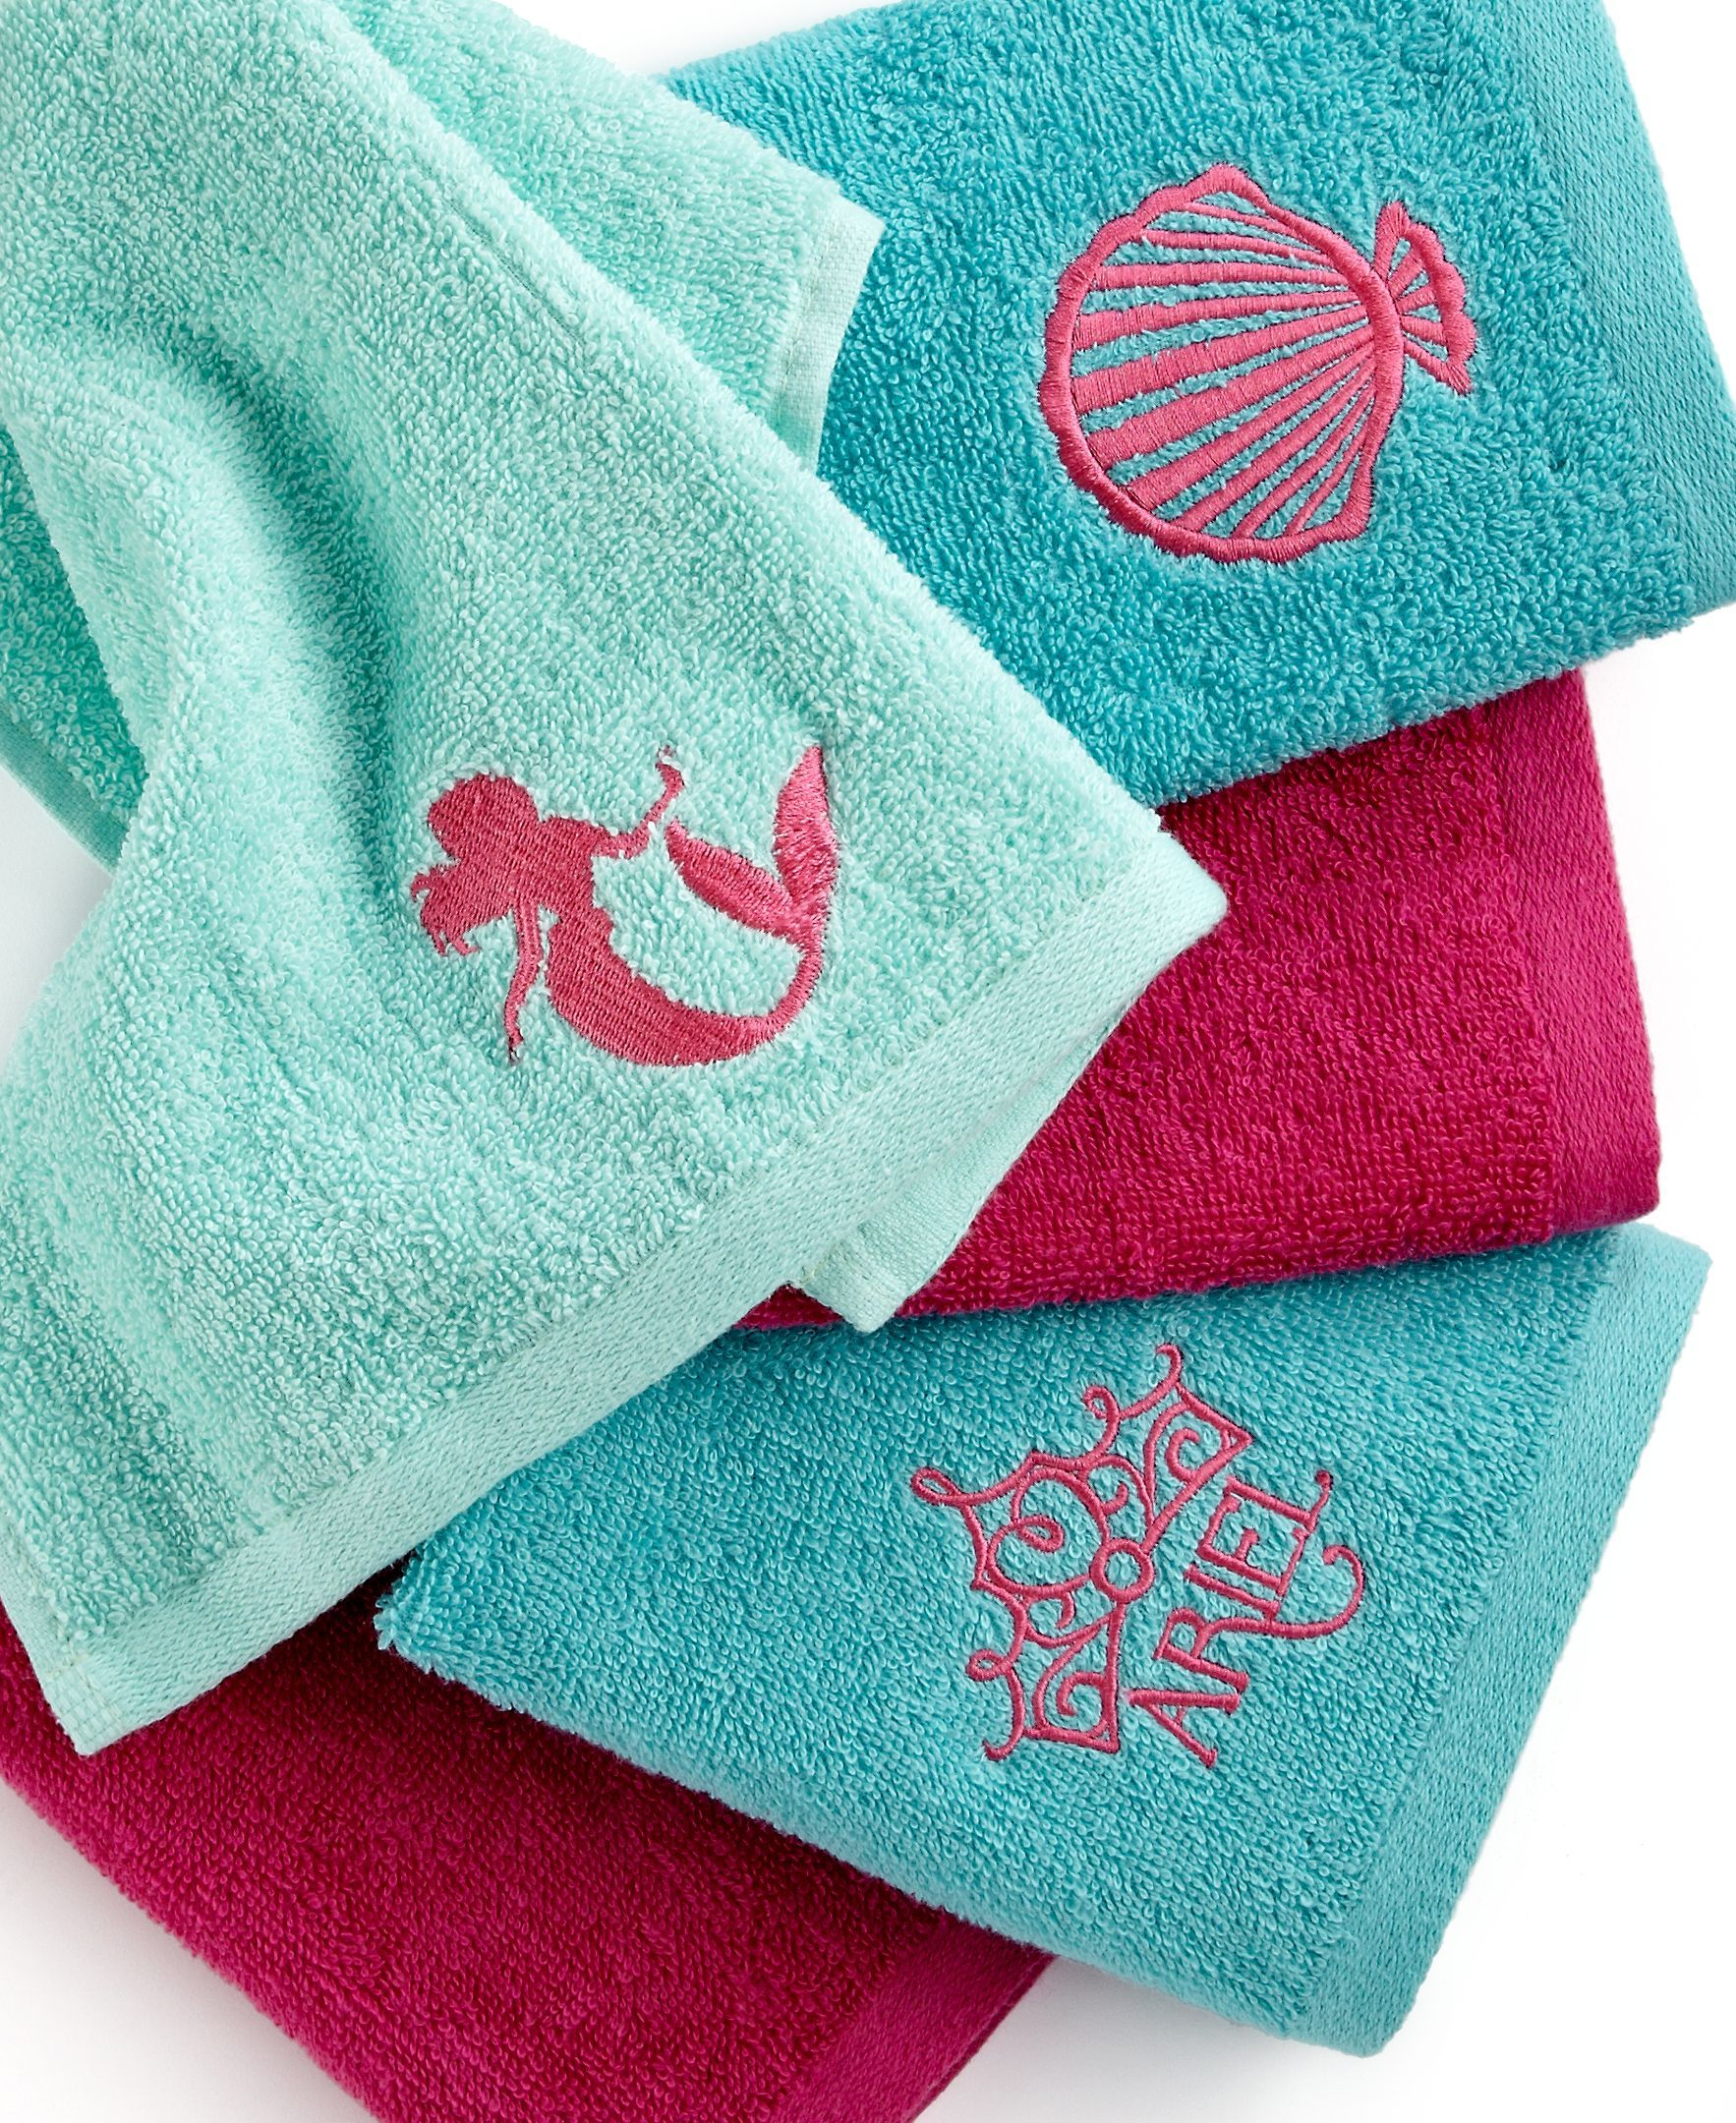 Disney Bath Accessories, Little Mermaid Shimmer and Gleam ...